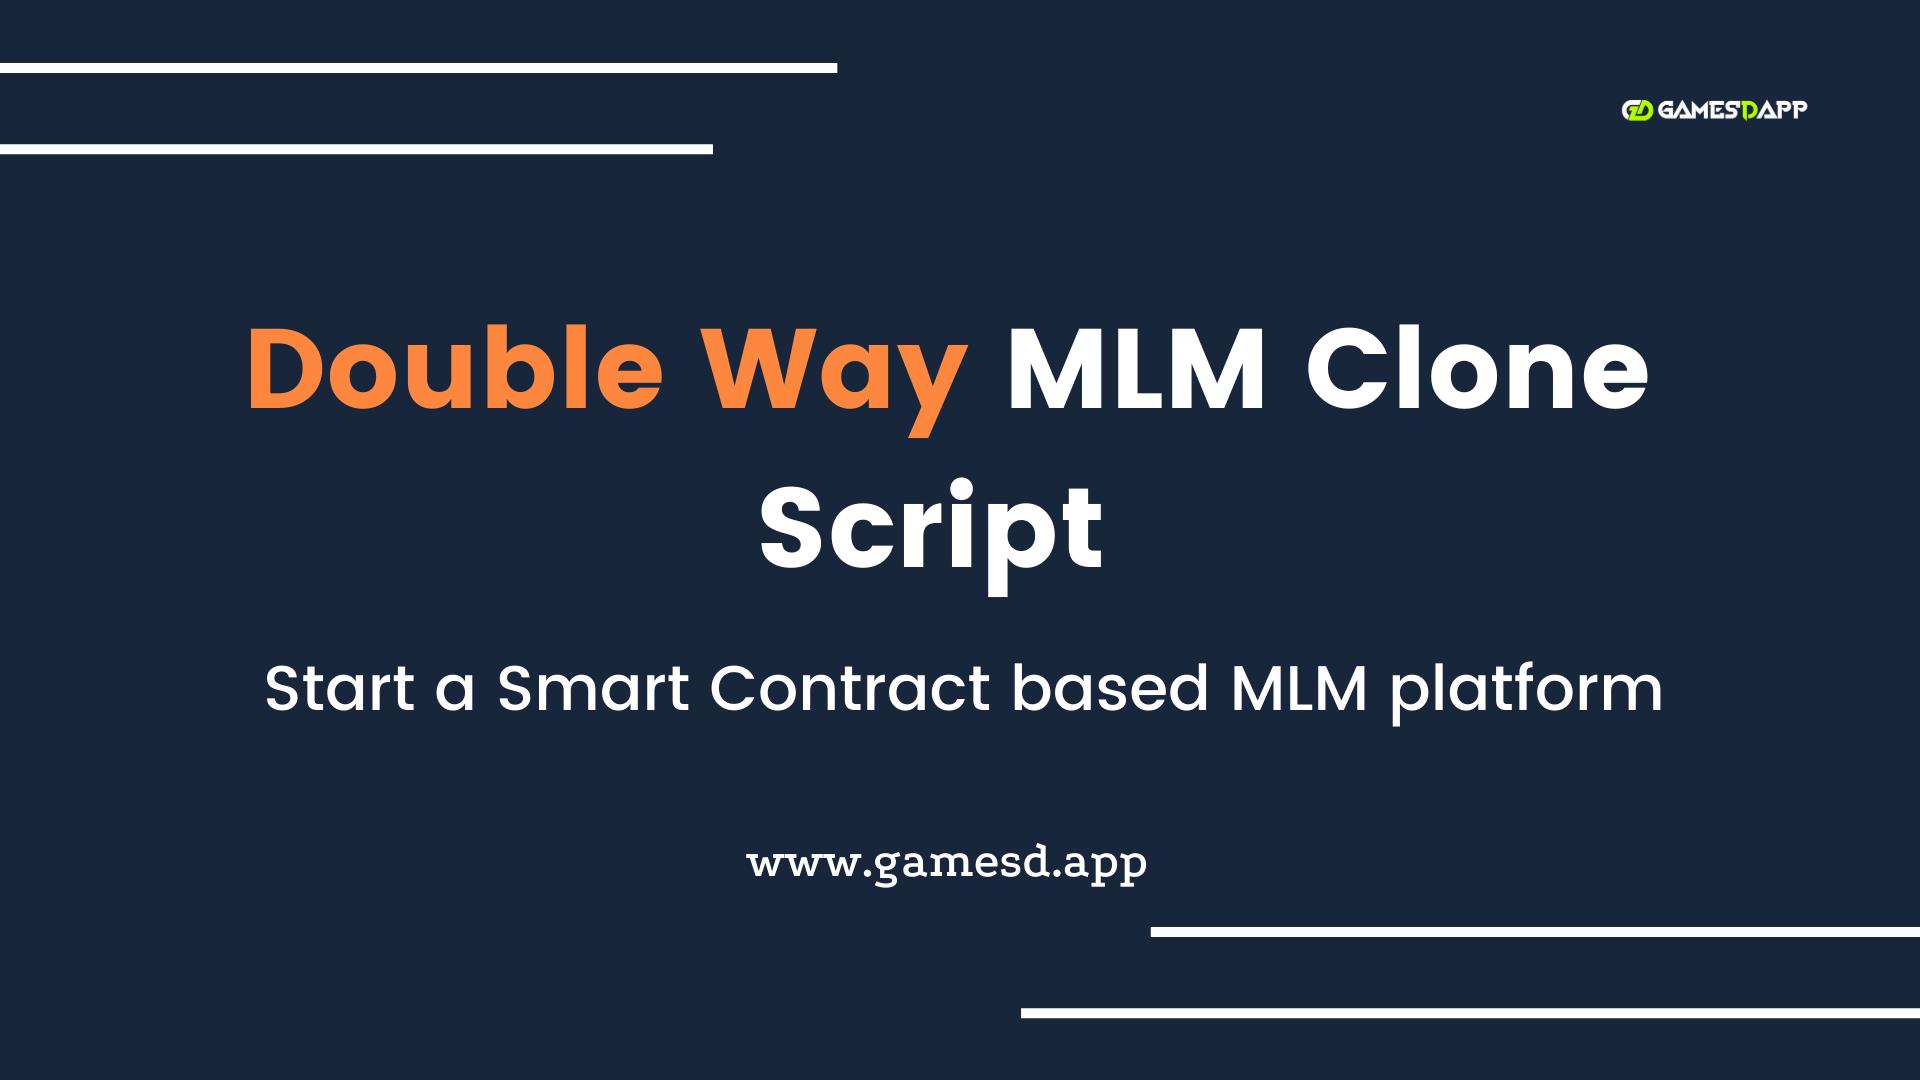 Doubleway Clone Script - To Build Ethereum Smart Contract Based MLM Platform Like Doubleway